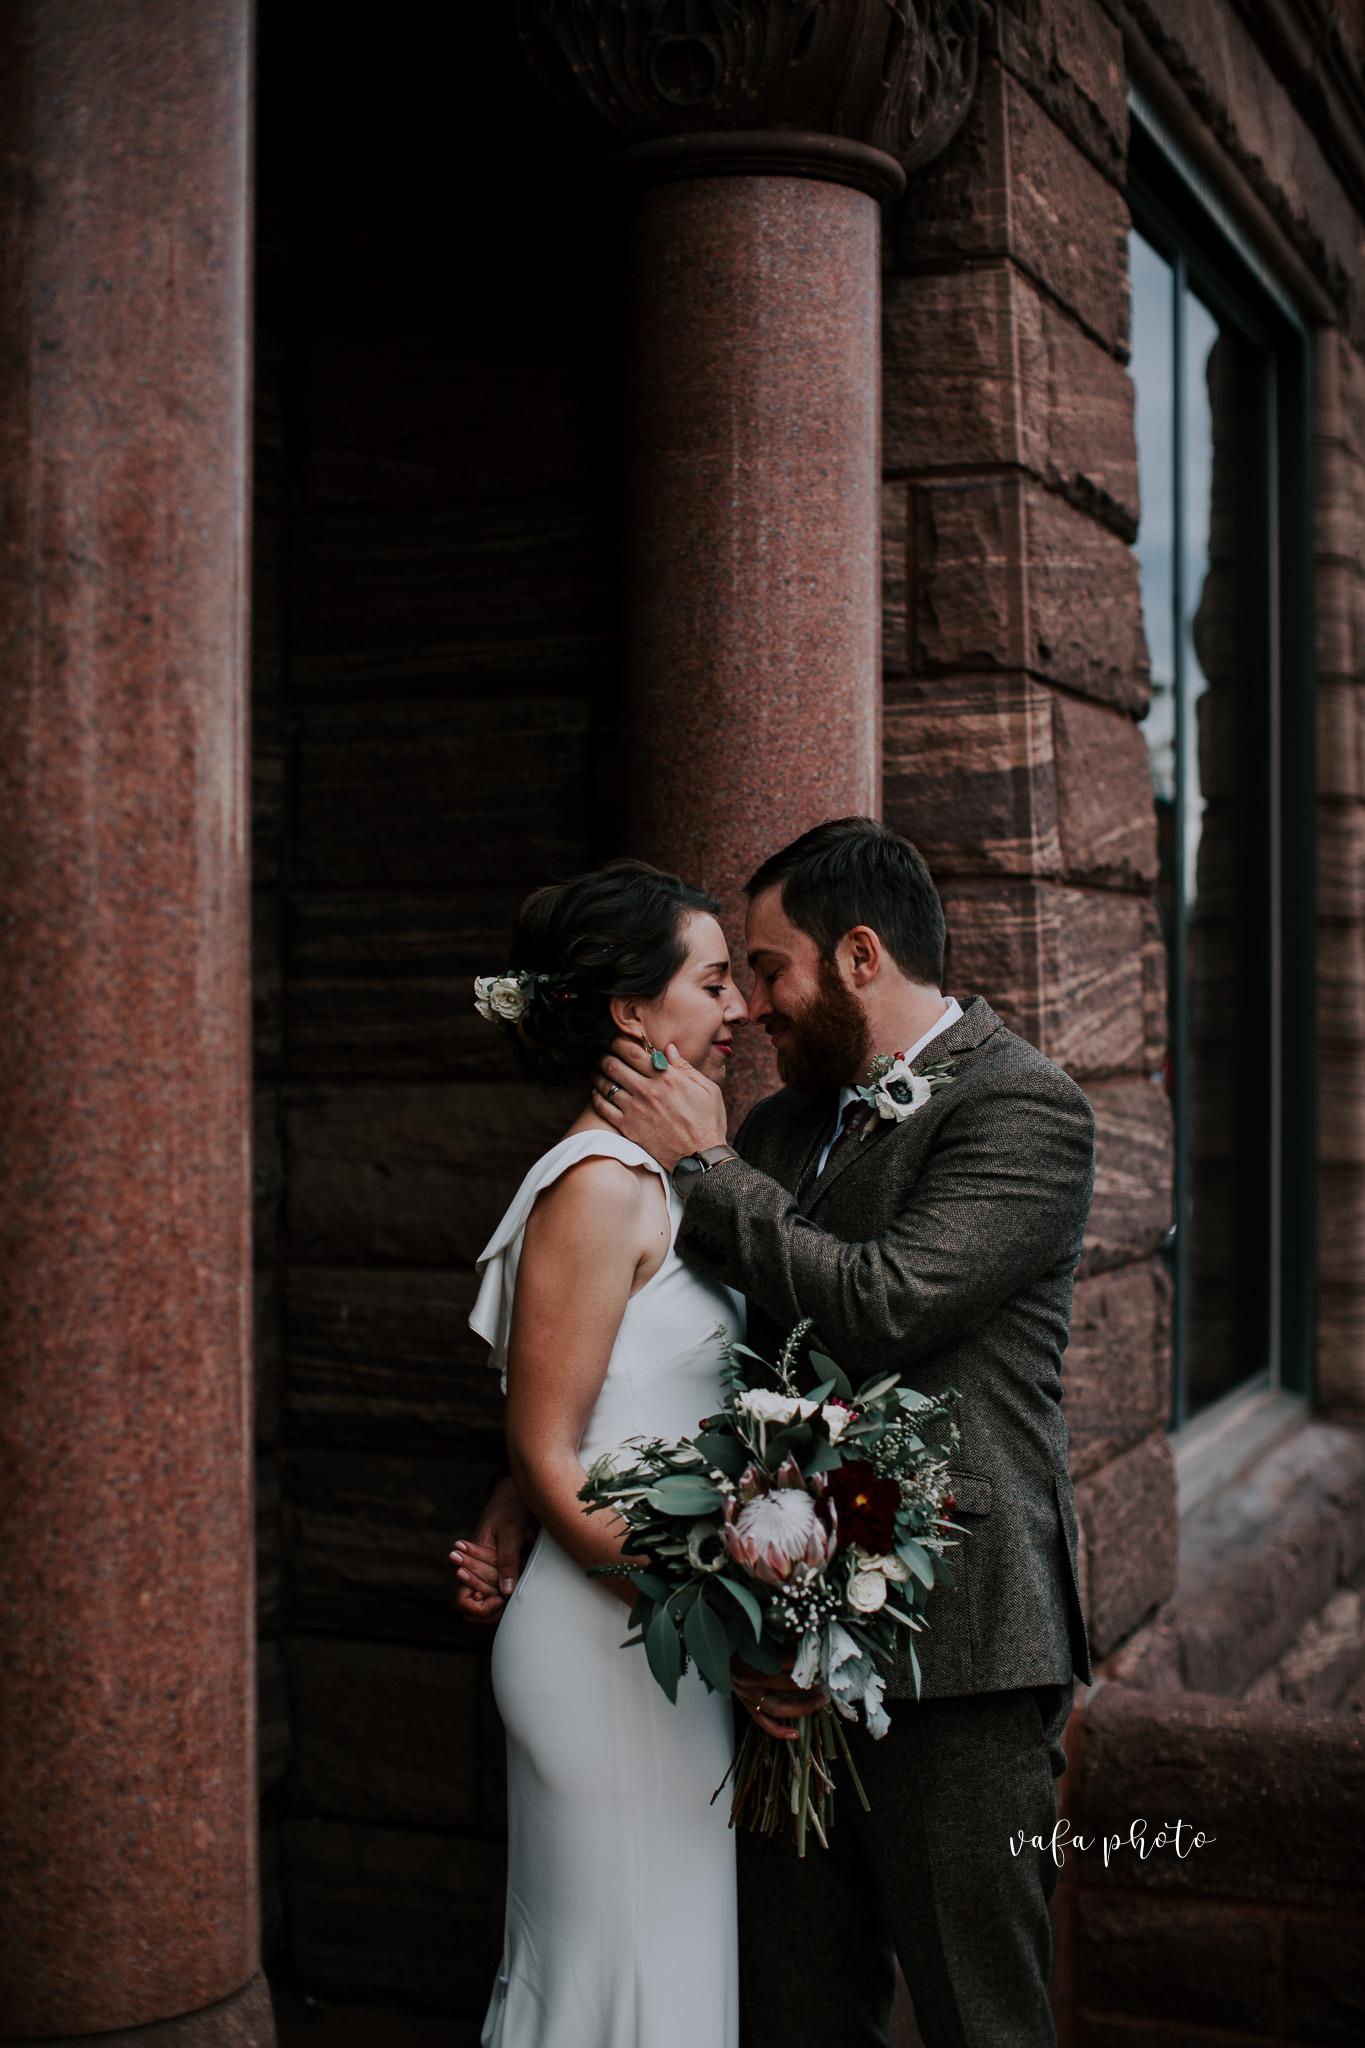 Little-Presque-Isle-Michigan-Wedding-Kim-Kyle-Vafa-Photo-559.jpg